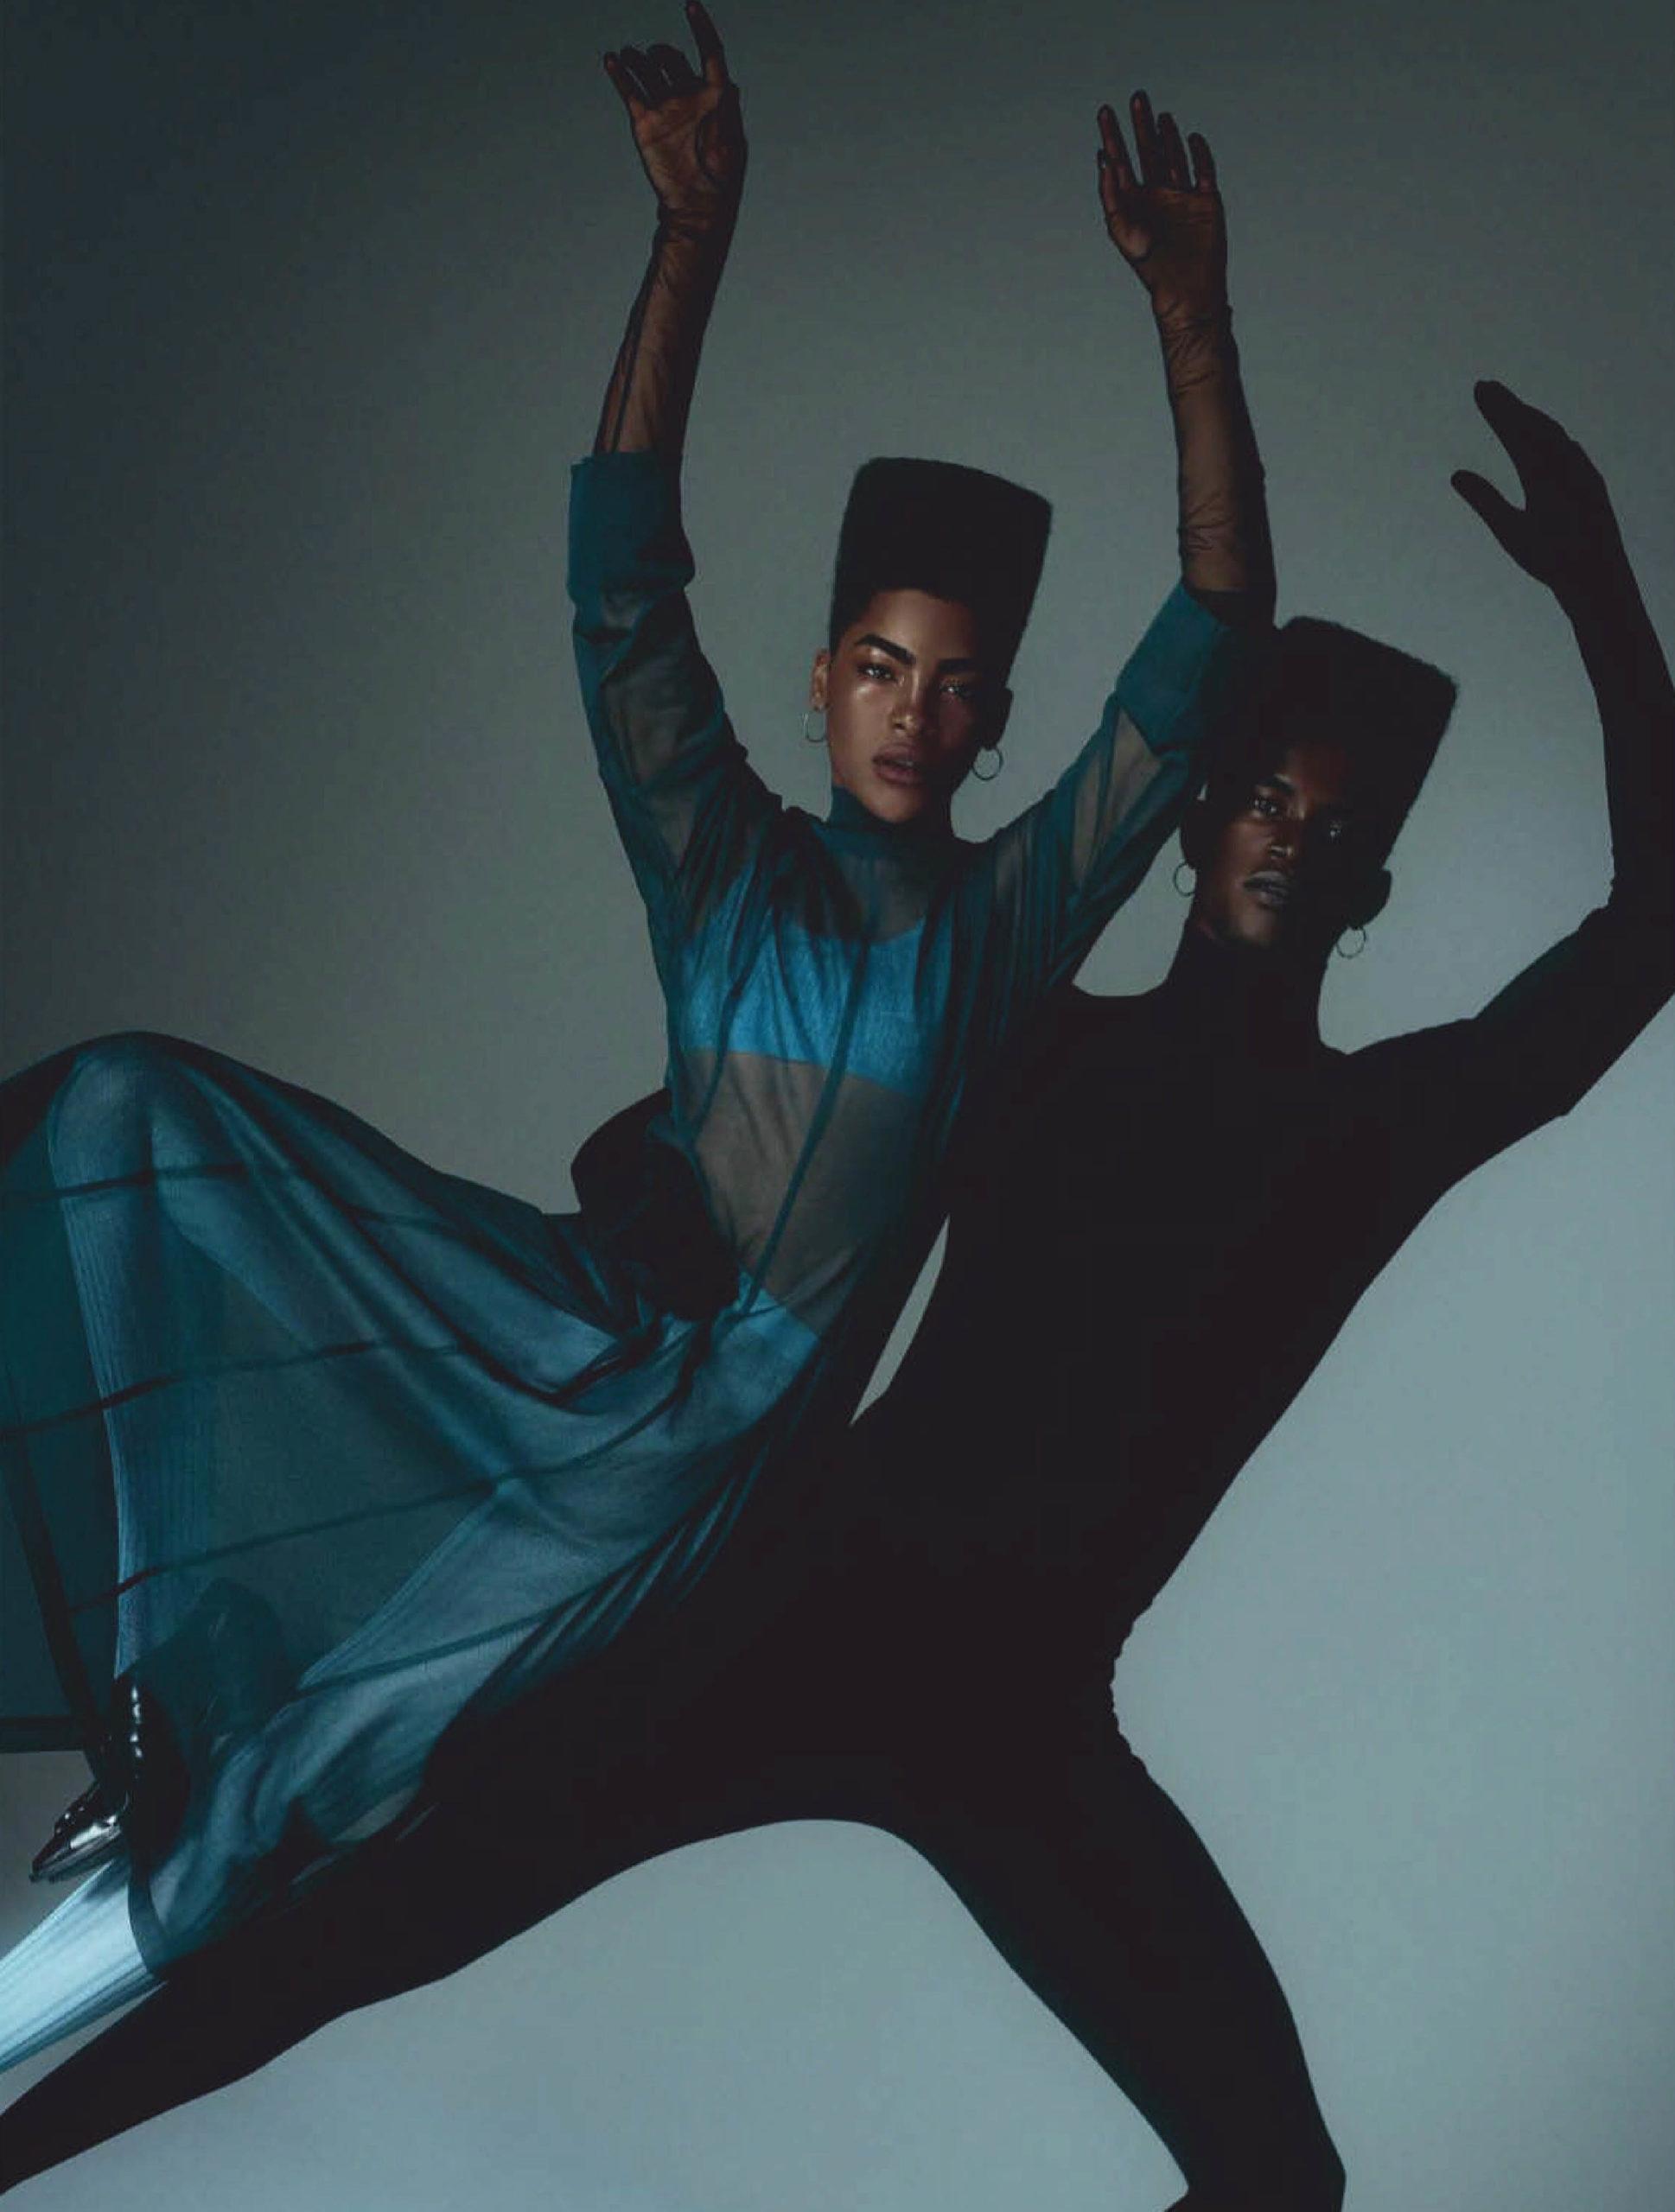 Geordette Cervantes and Salomon Diaz by Daniel Clavero for Vogue Mexico & Latin America November 2020